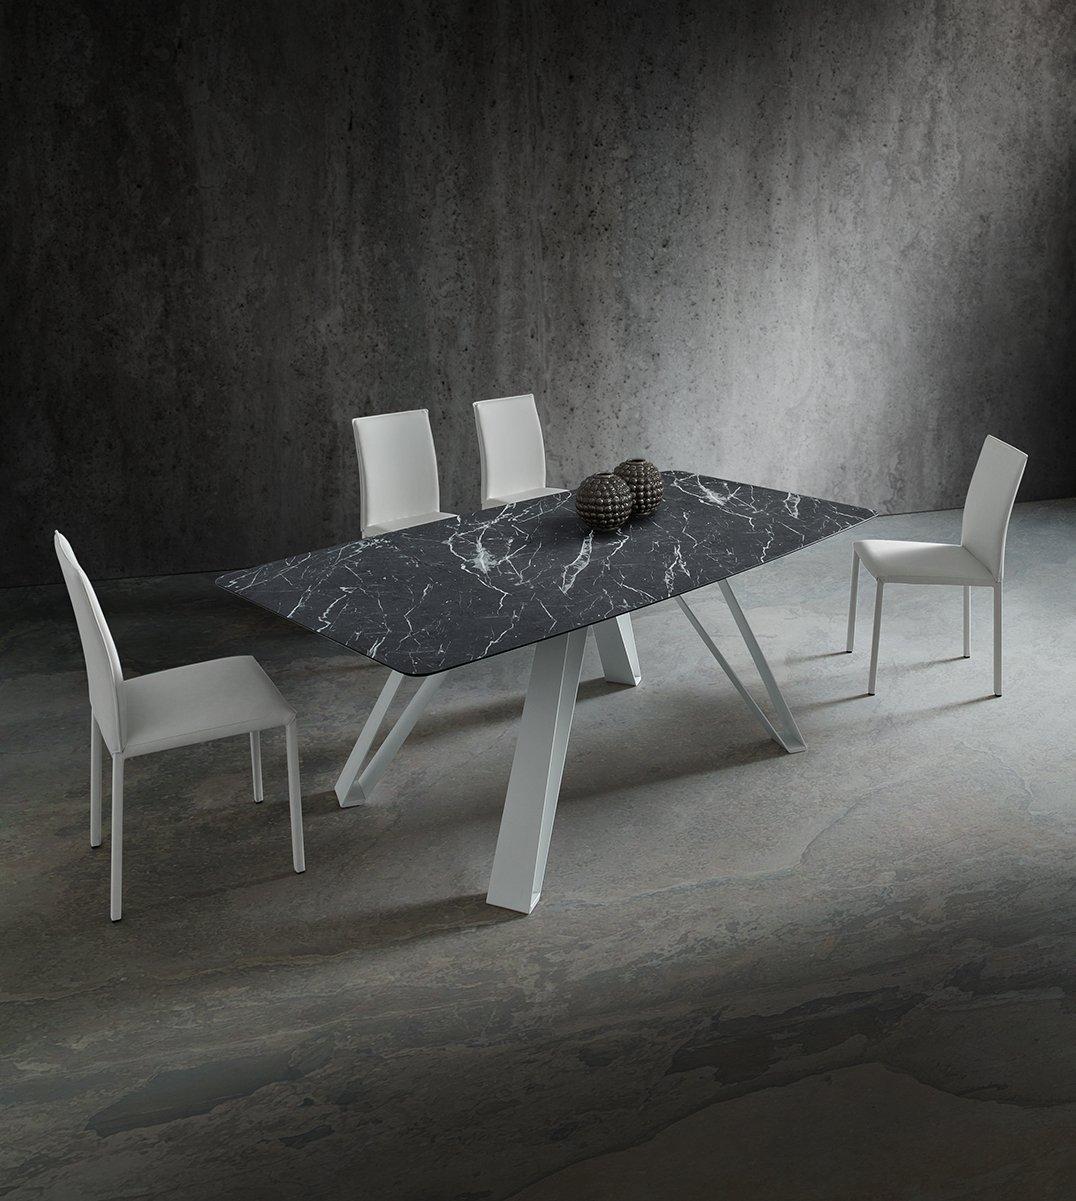 Tavolo sala da pranzo Noah Hpl Strat. Alicante La Primavera